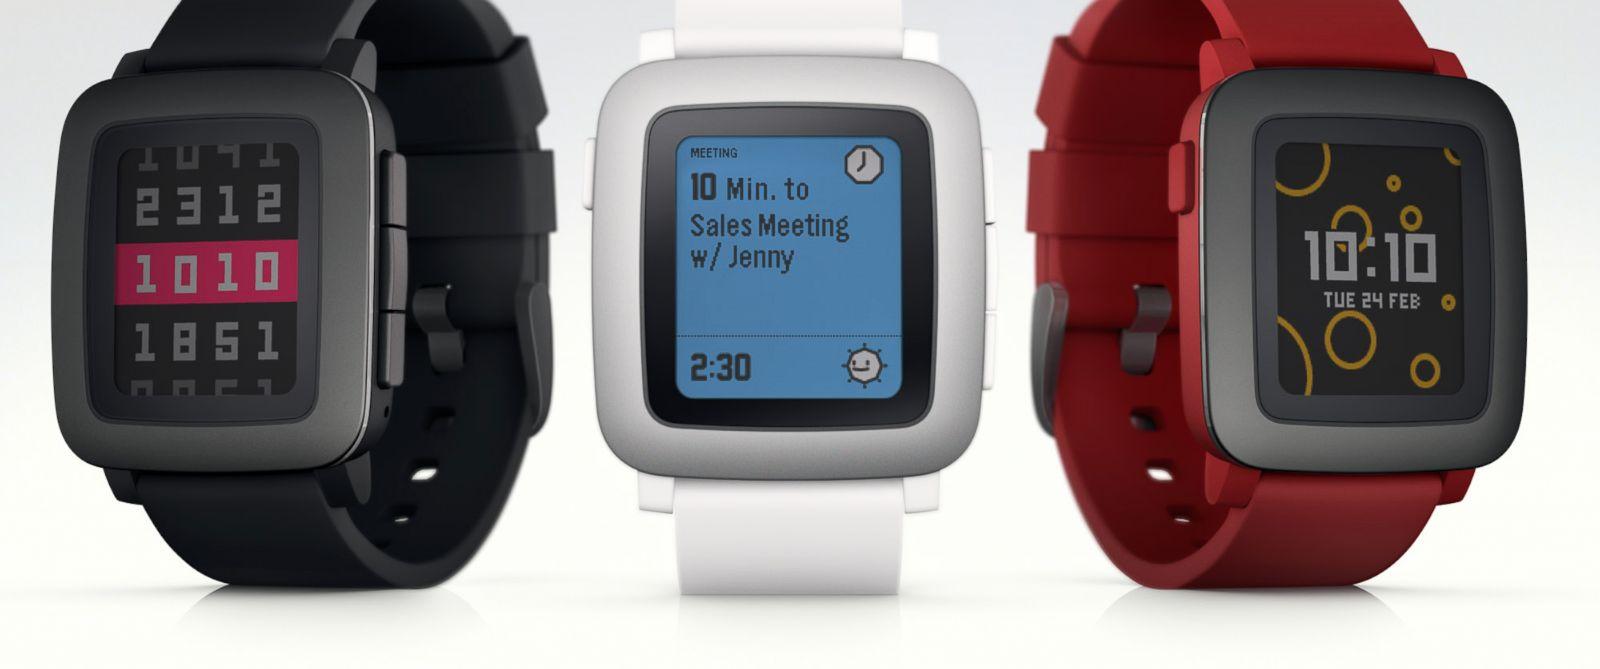 Pebble Time: Smart Watch Back on Kickstarter